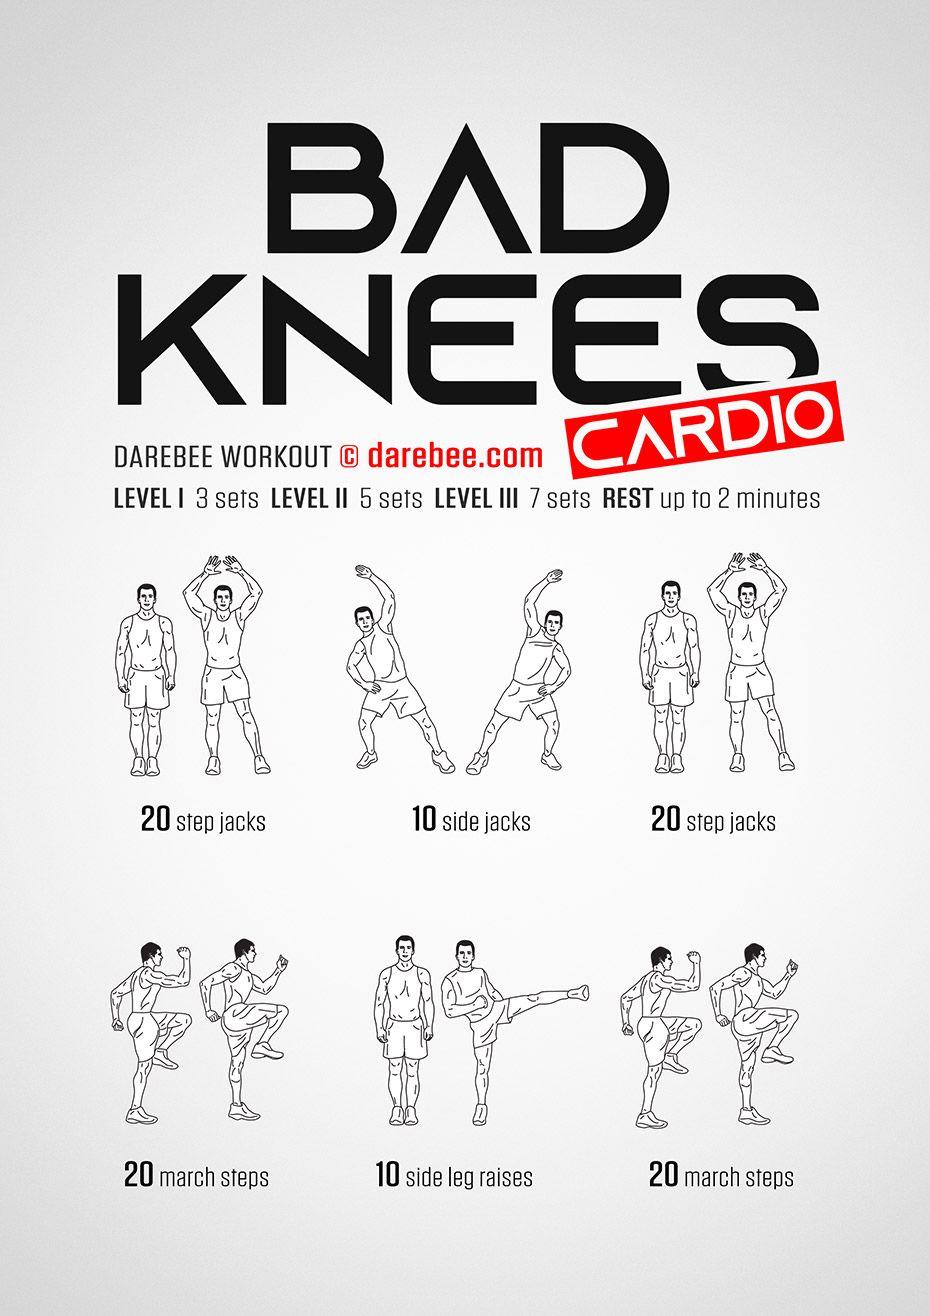 Bad Knees Cardio Workout